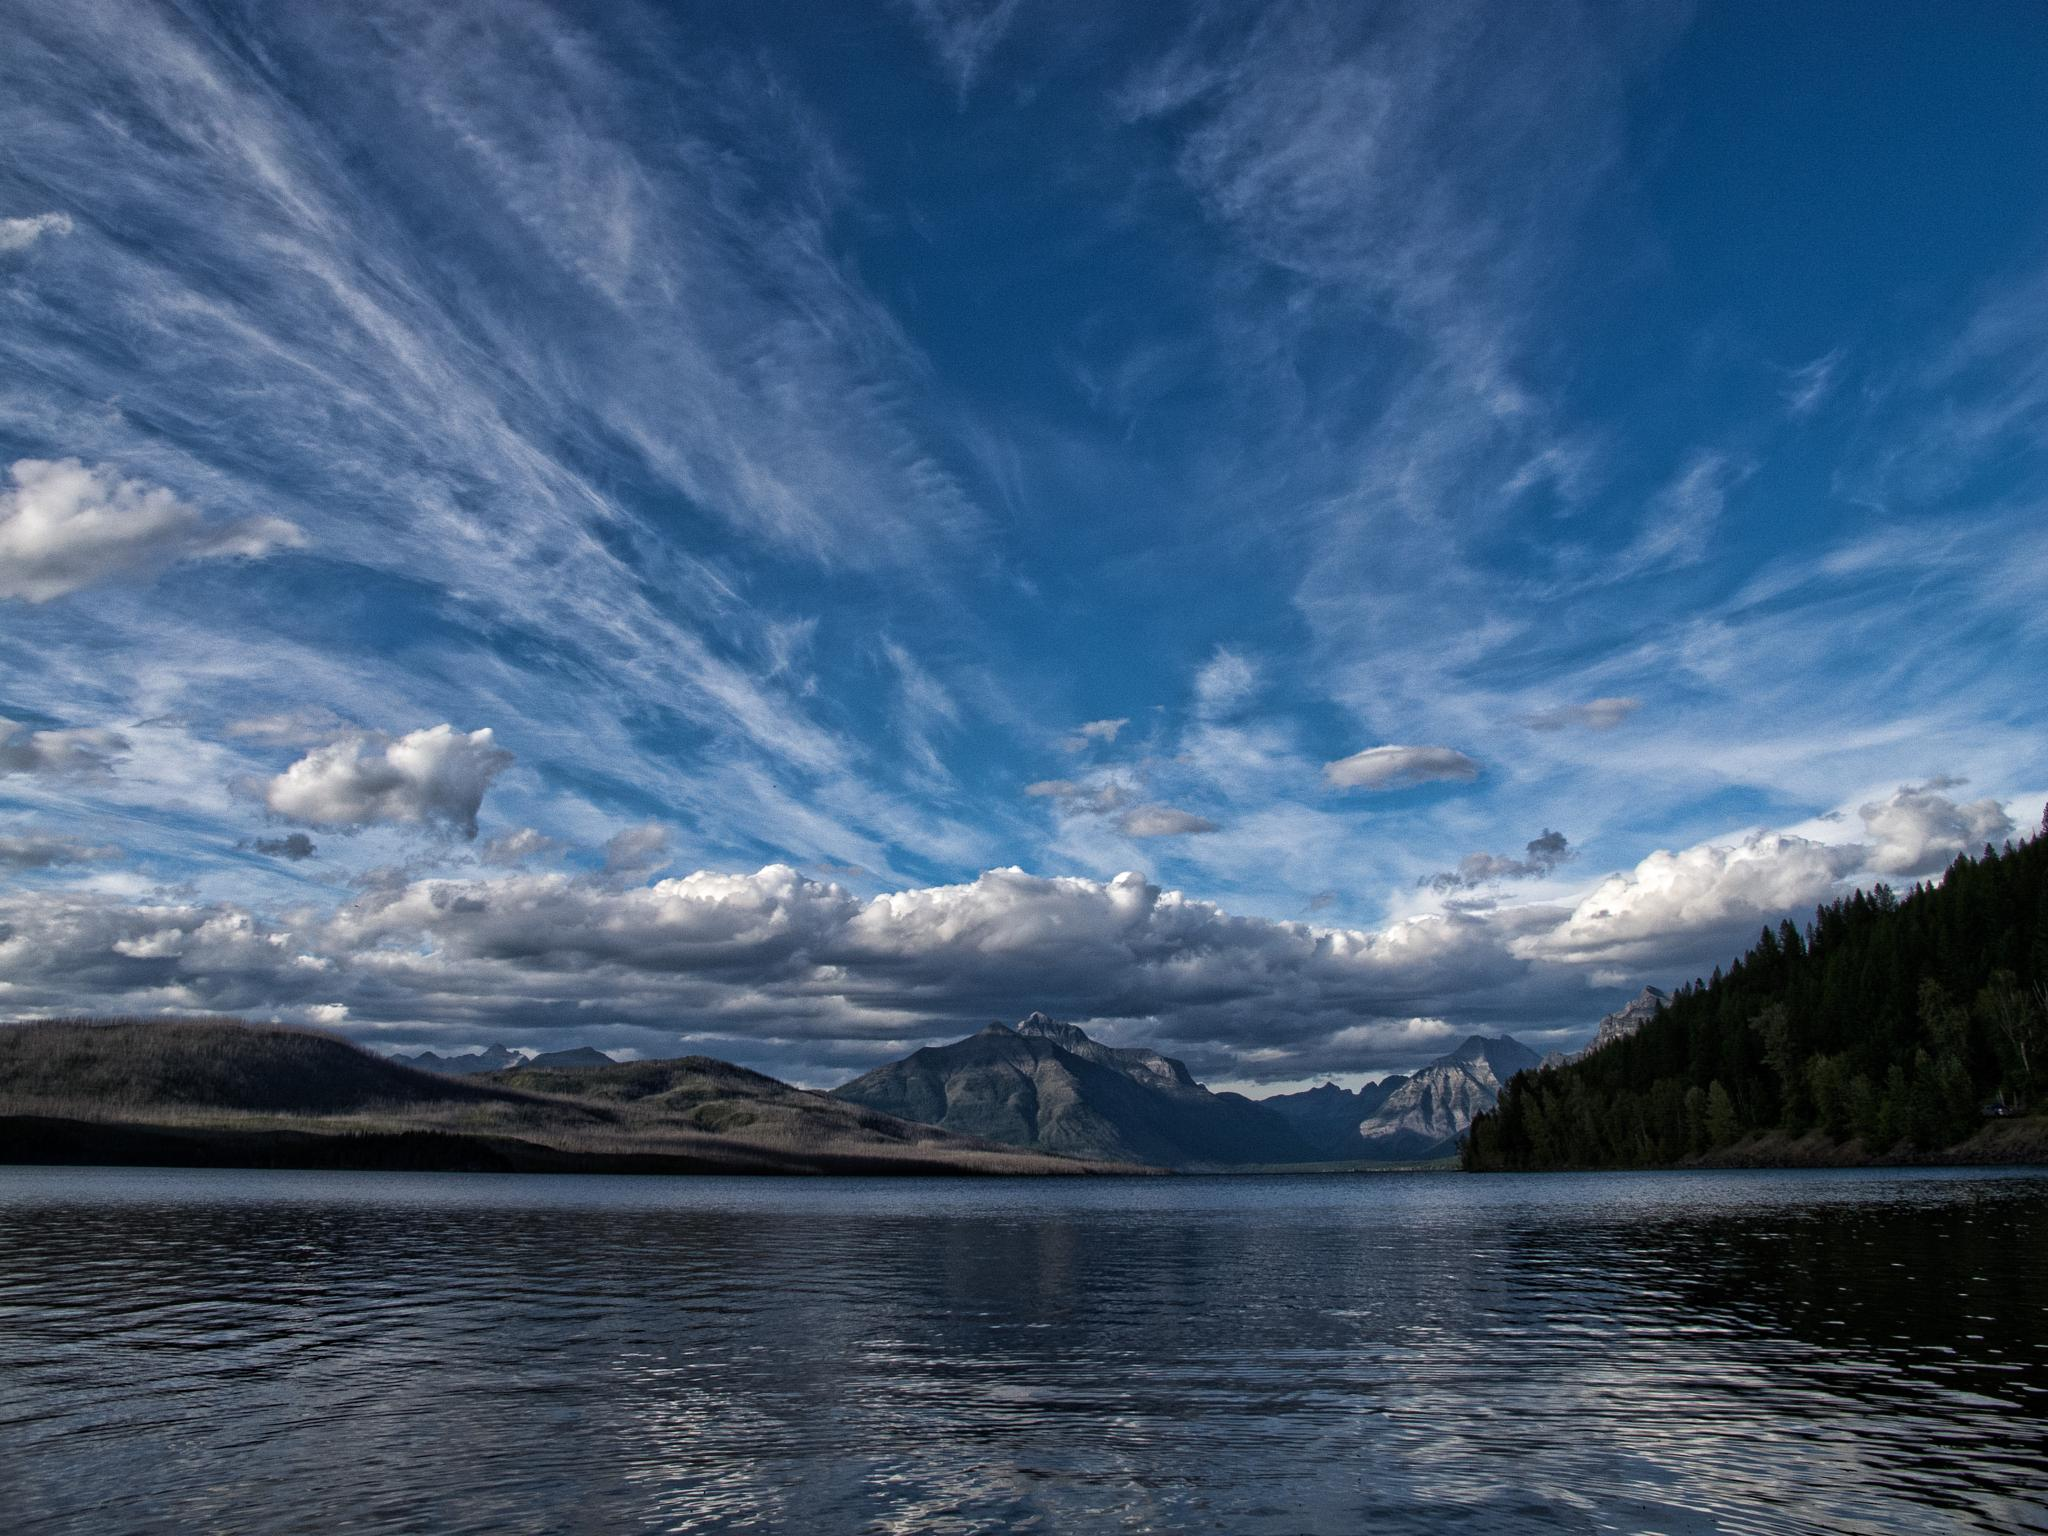 Lake McDonald, Glacier National Park, Montana by graibeerd